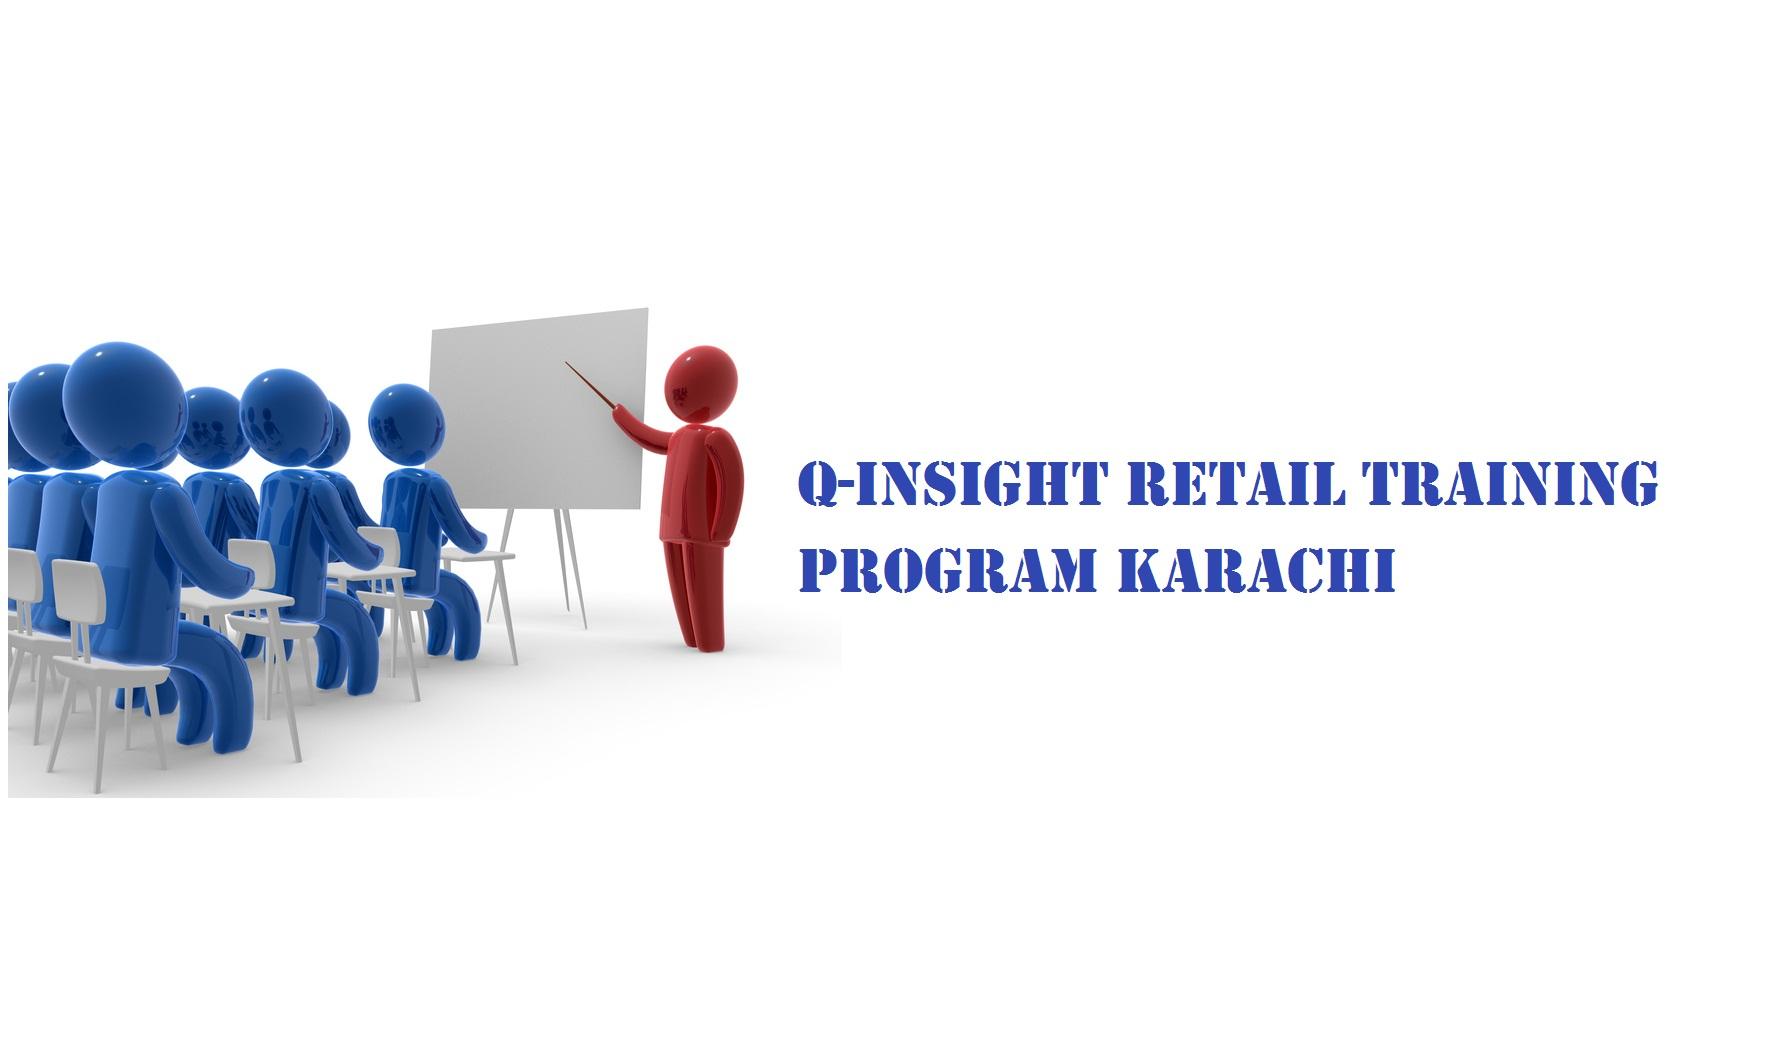 Photo of Q-insight Retail Training Program Karachi